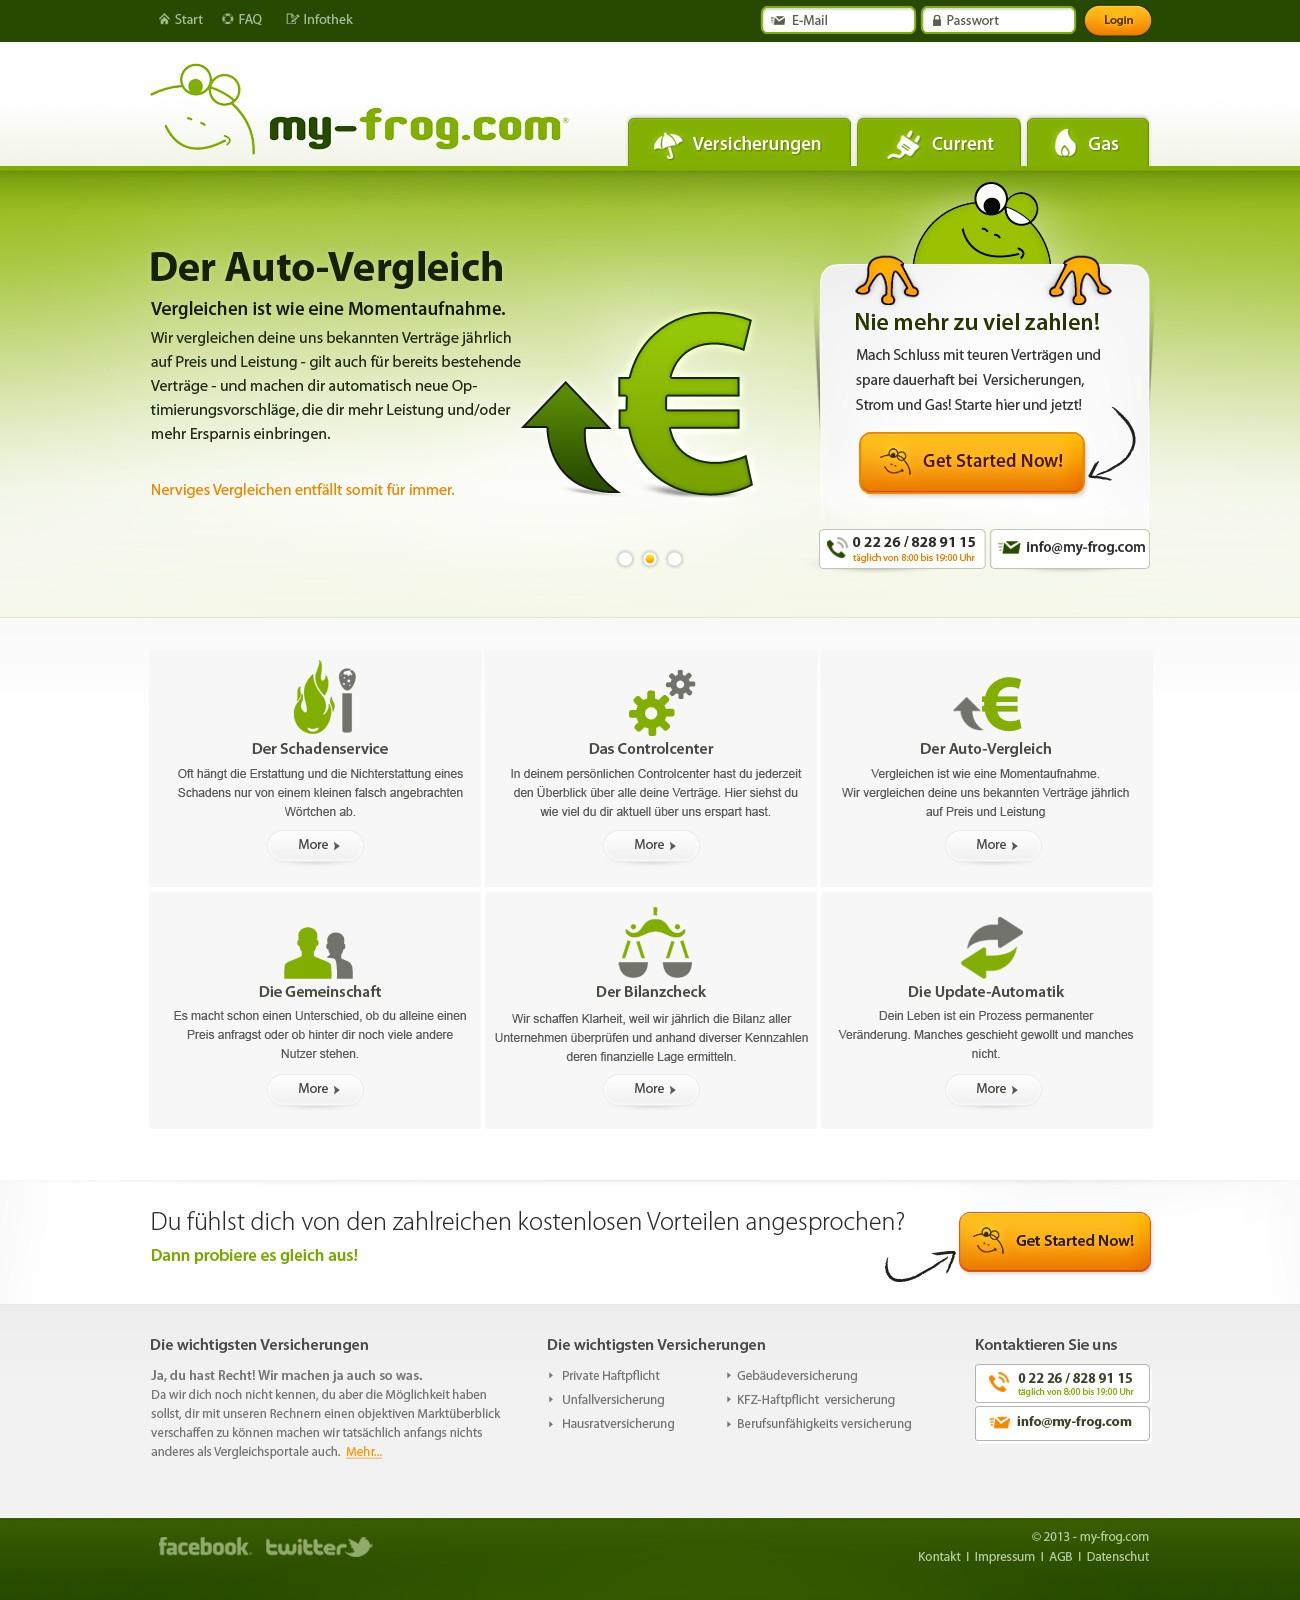 my-frog.com benötigt ein website design